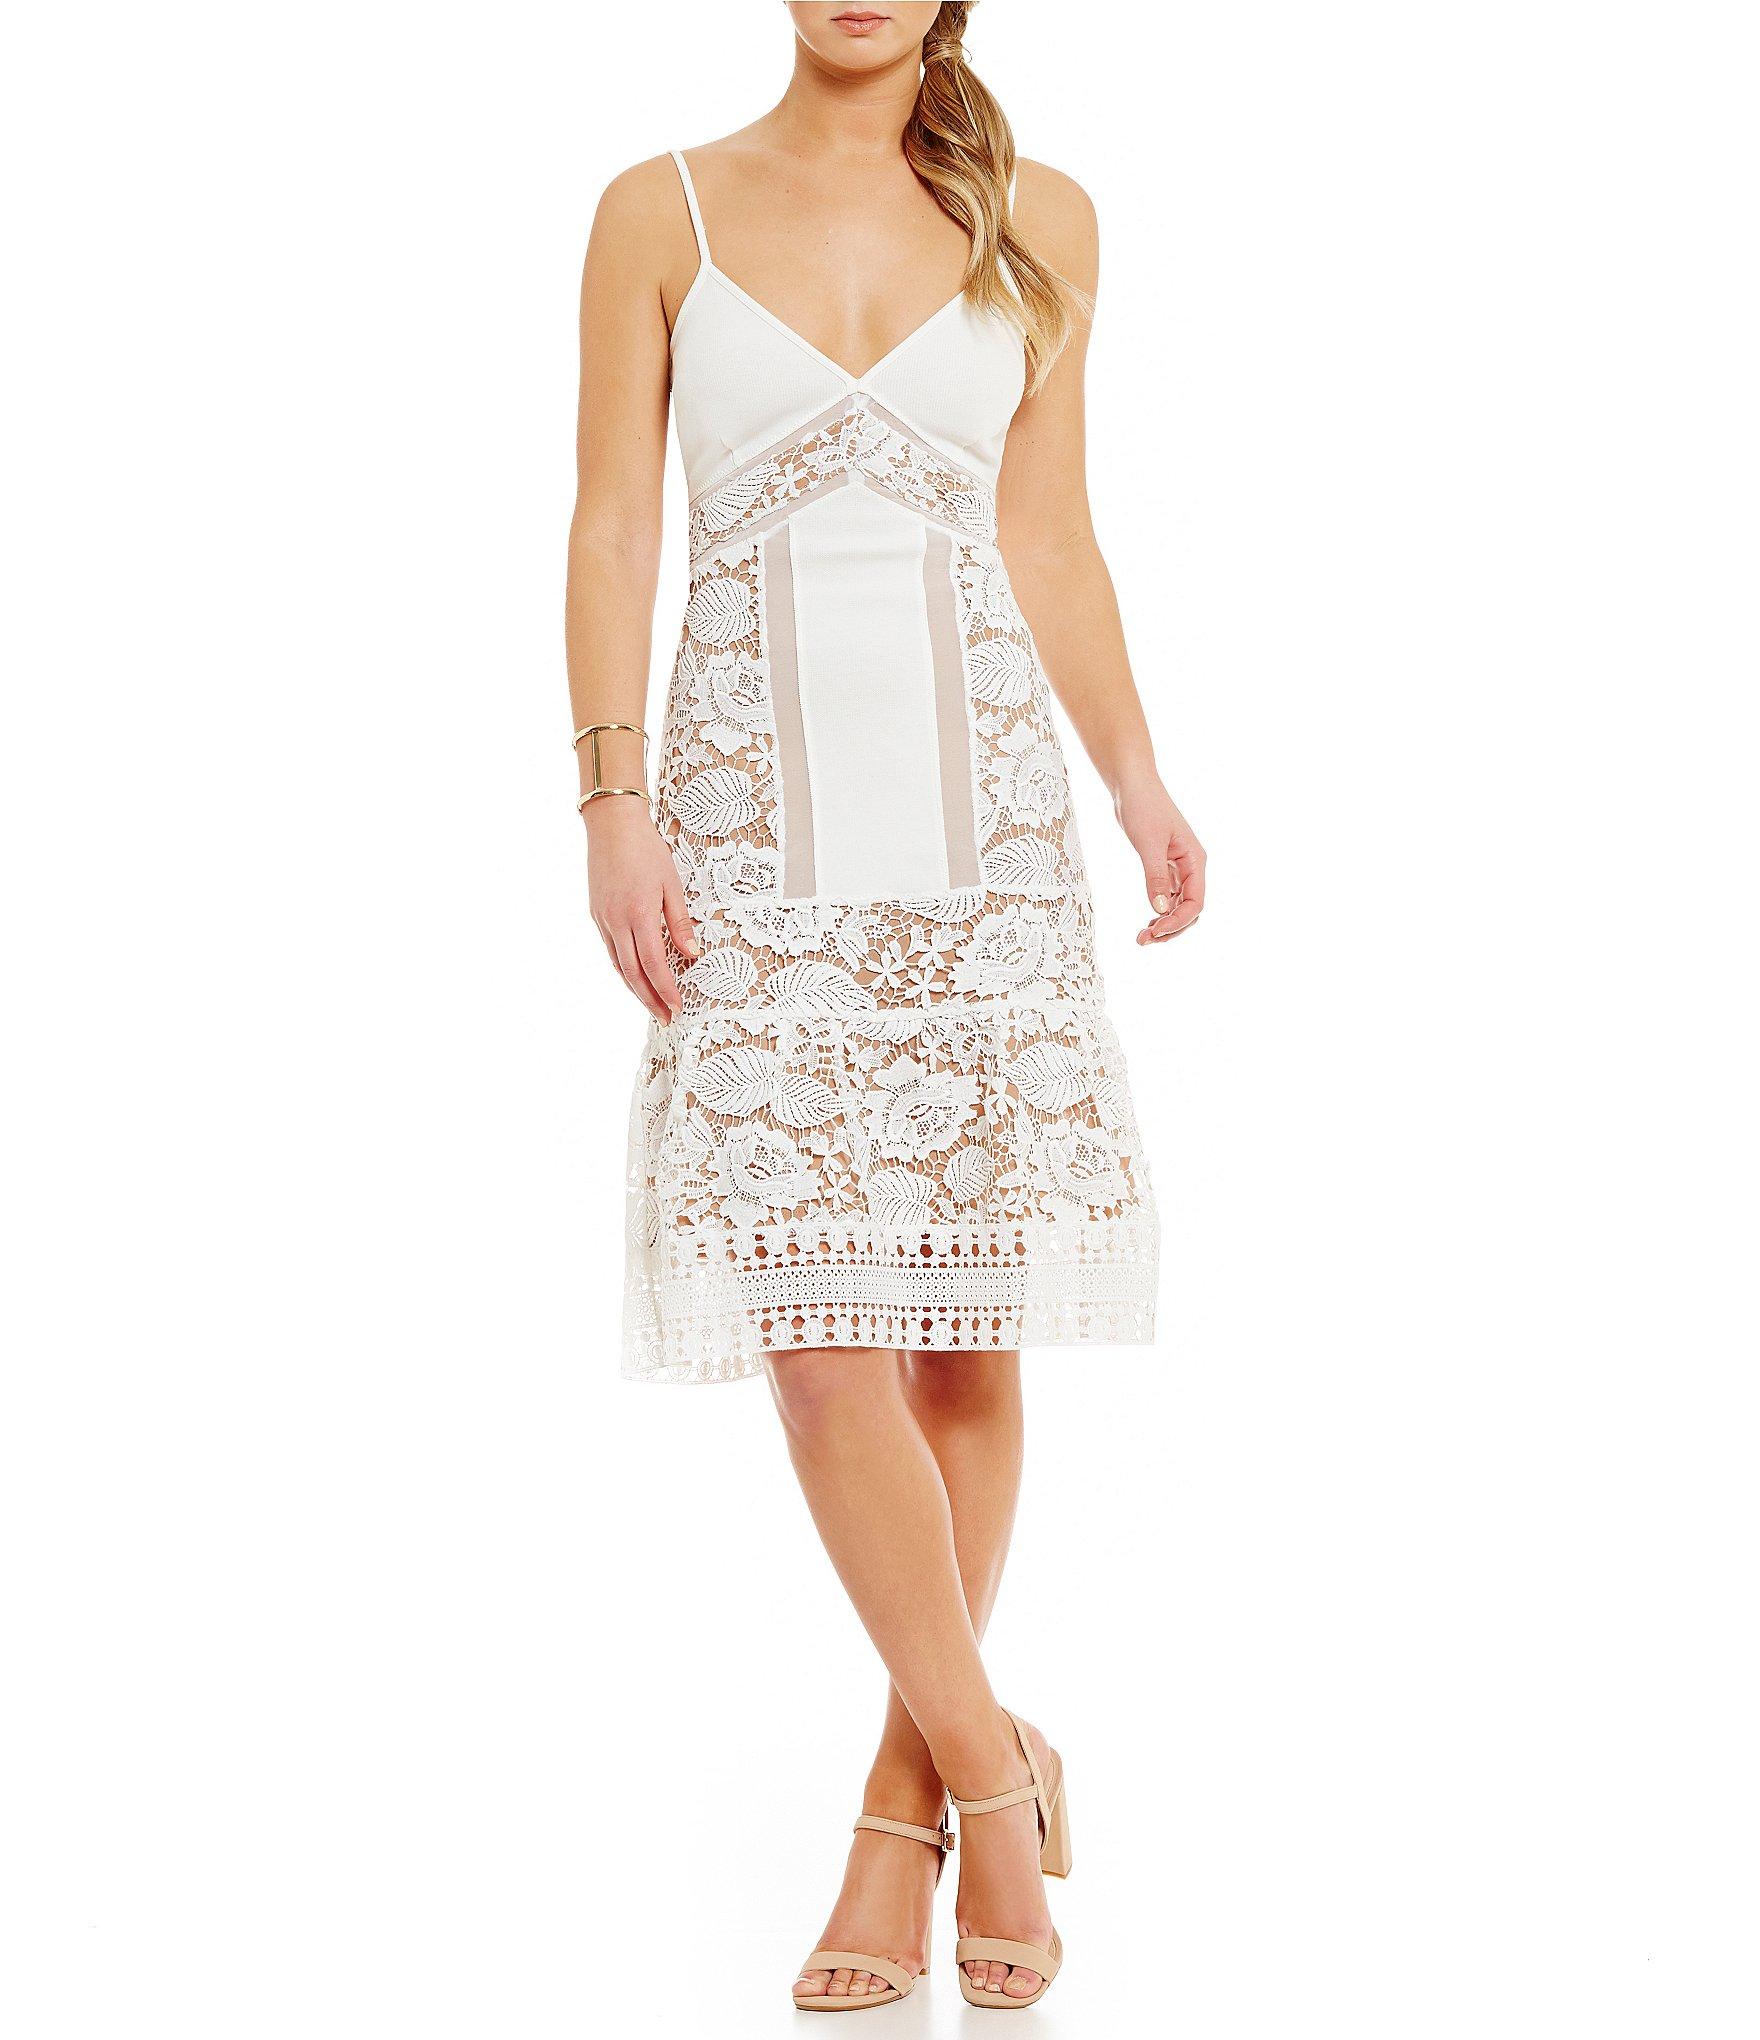 Women\'s Clothing | Dresses | Sundresses | Dillards.com